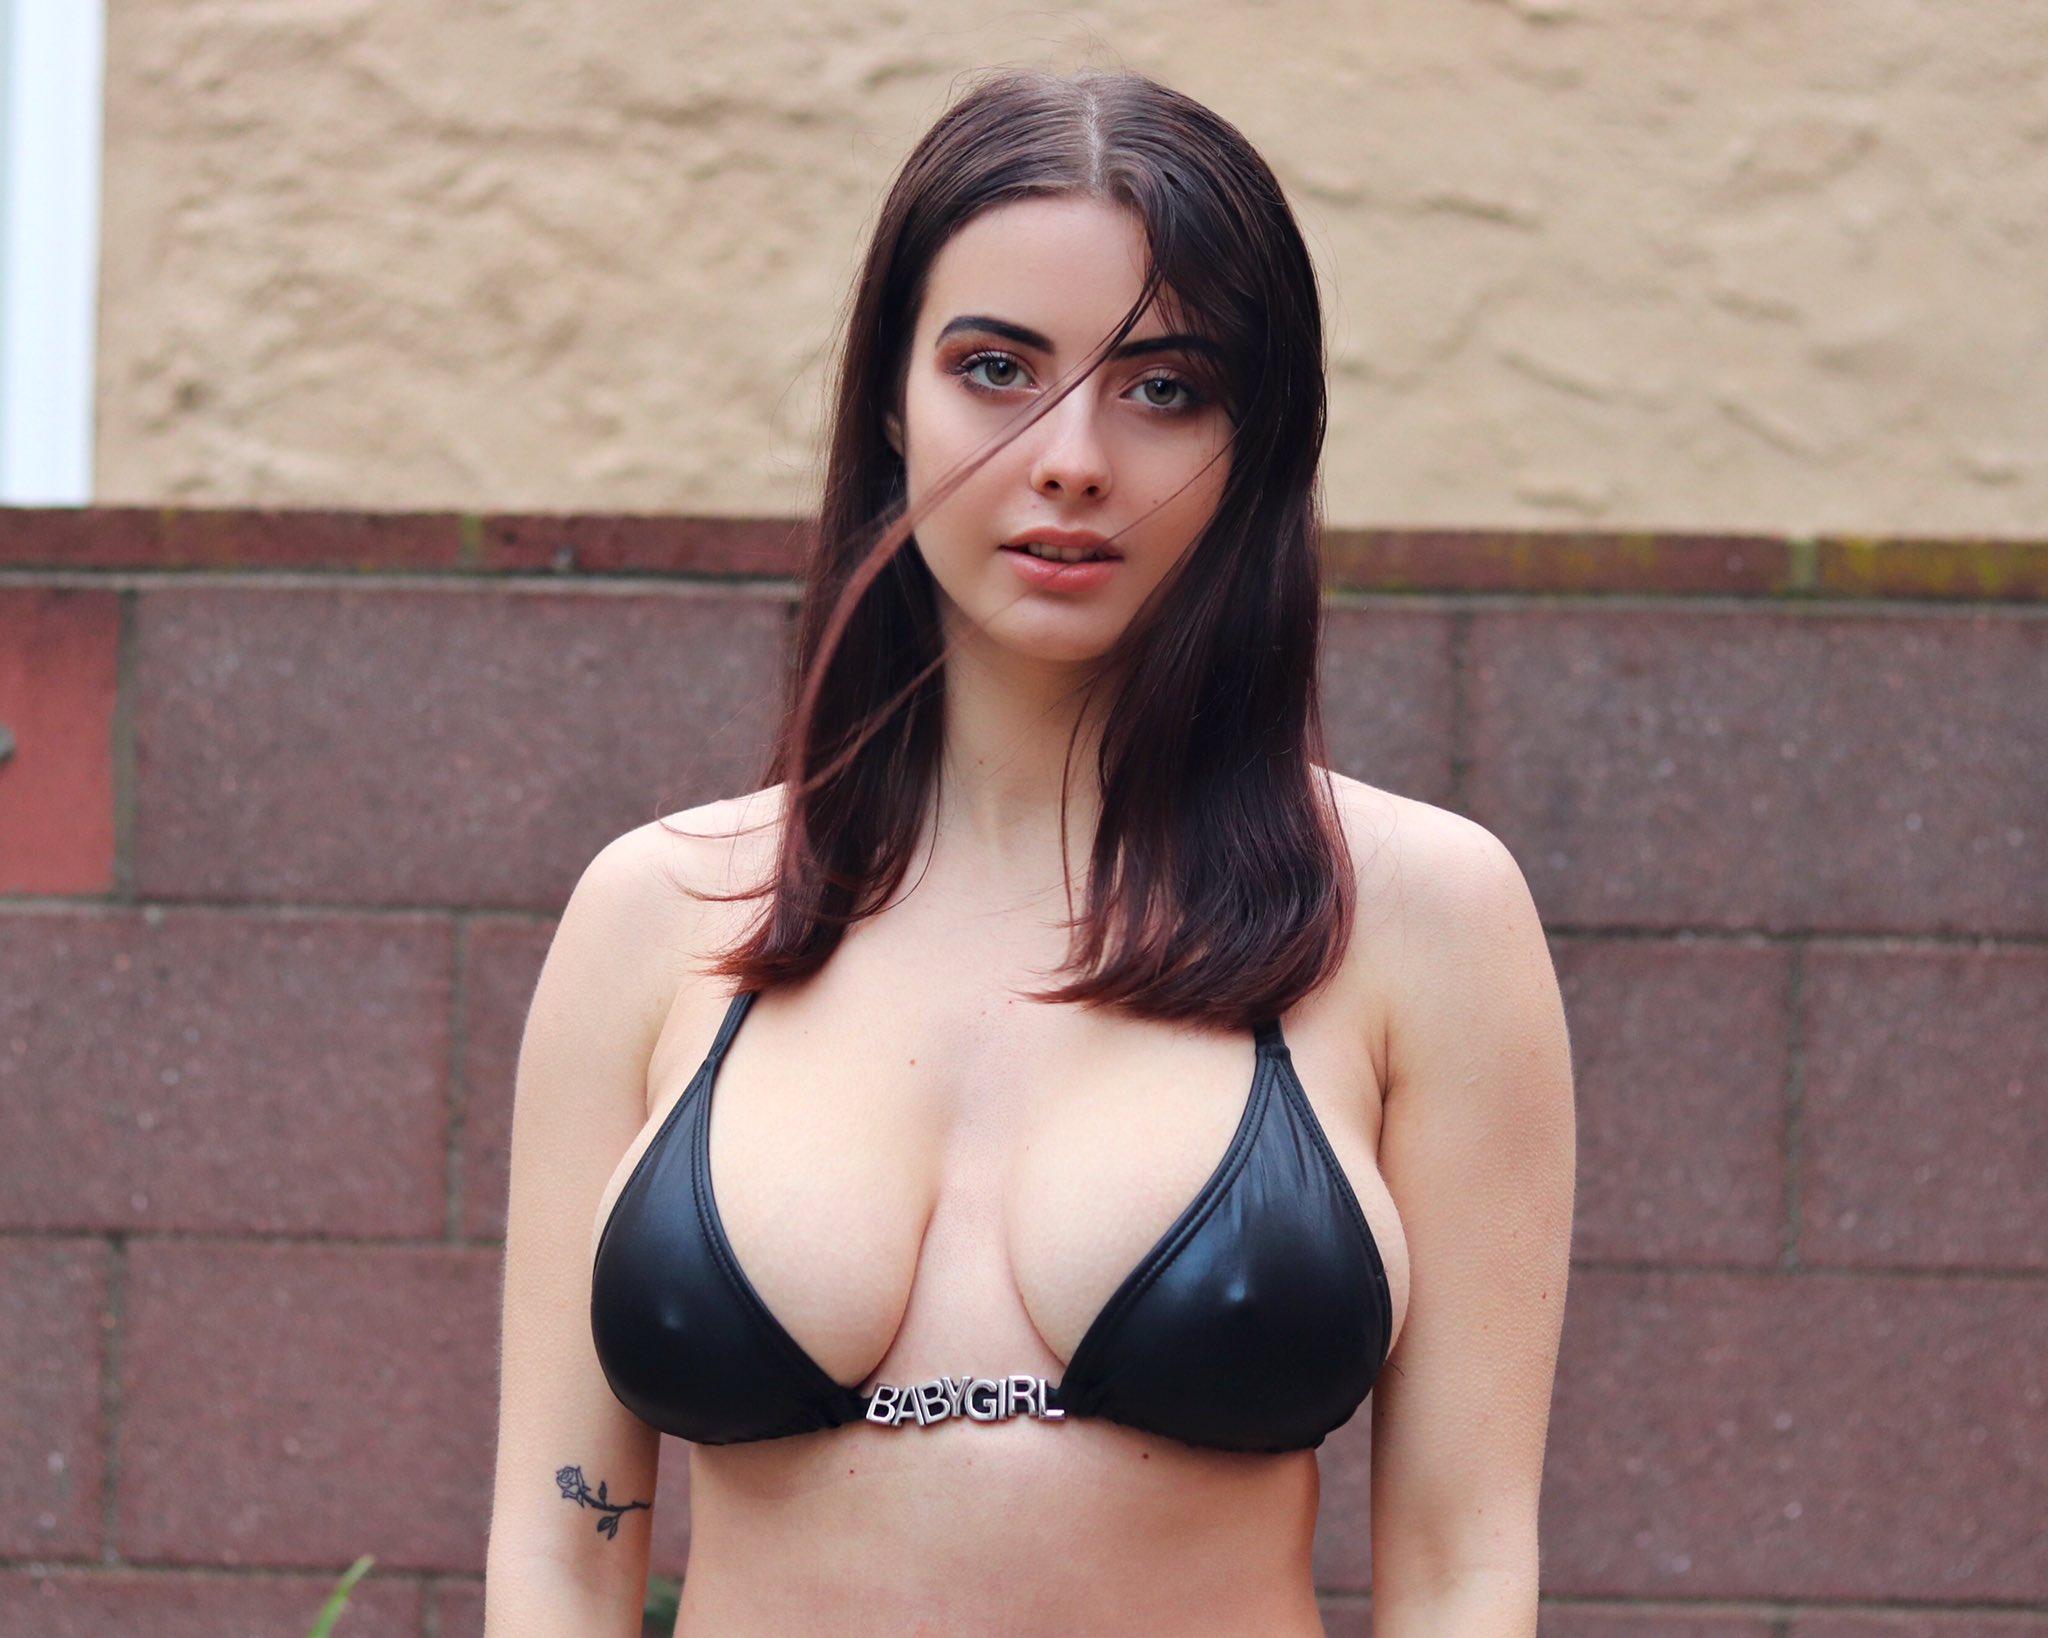 People 2048x1638 Julia Burch model brunette looking at viewer bikini nipples through clothing big boobs tattoo frontal view Julia hair in face Canadian Women